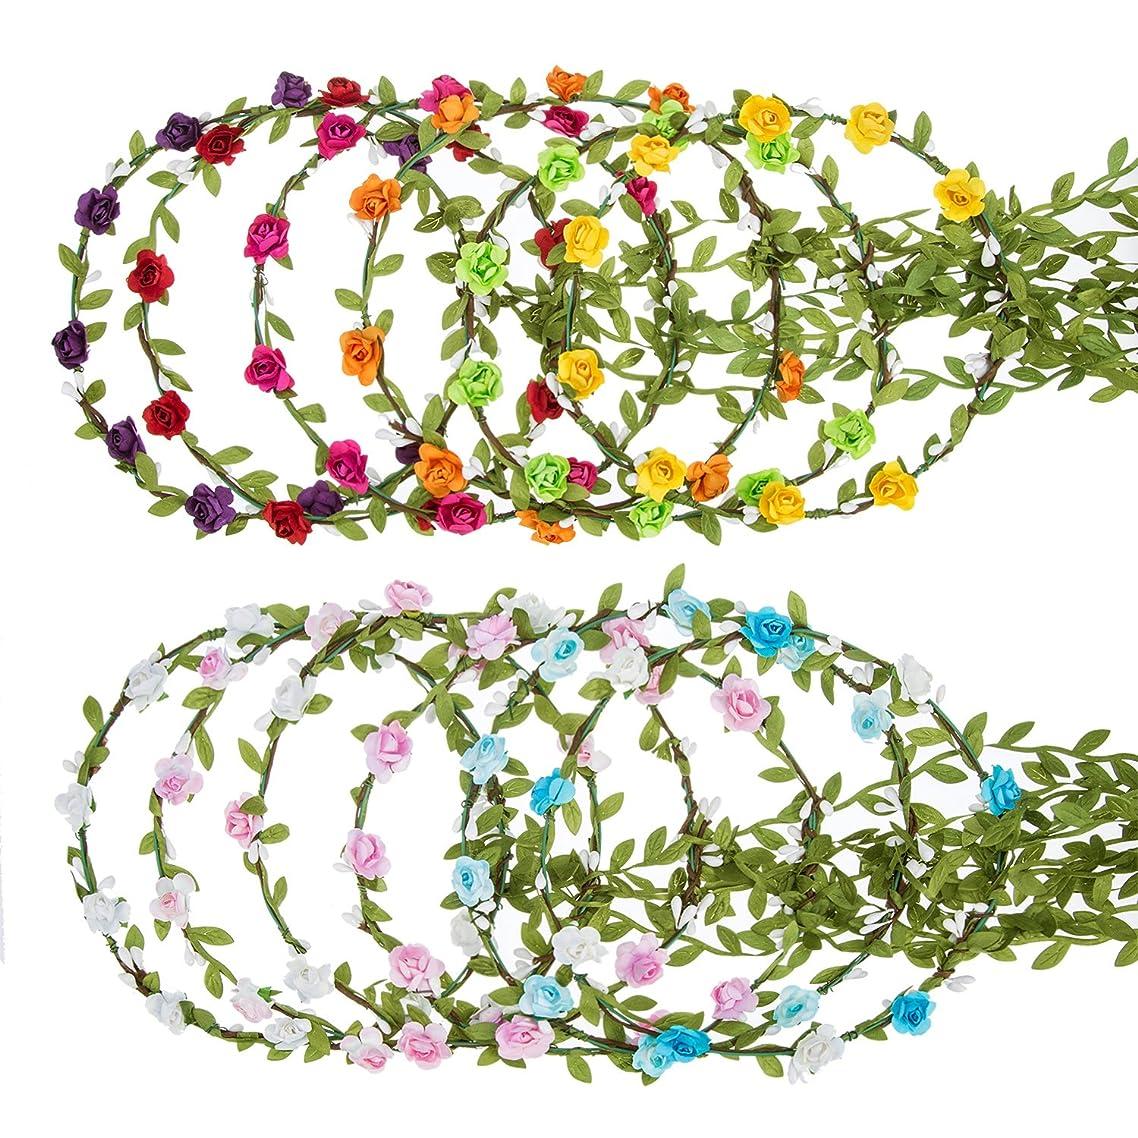 eBoot 12 Pieces Flower Crown Wreath Floral Garland Headbands for Wedding Beach Festival (Multicolor)